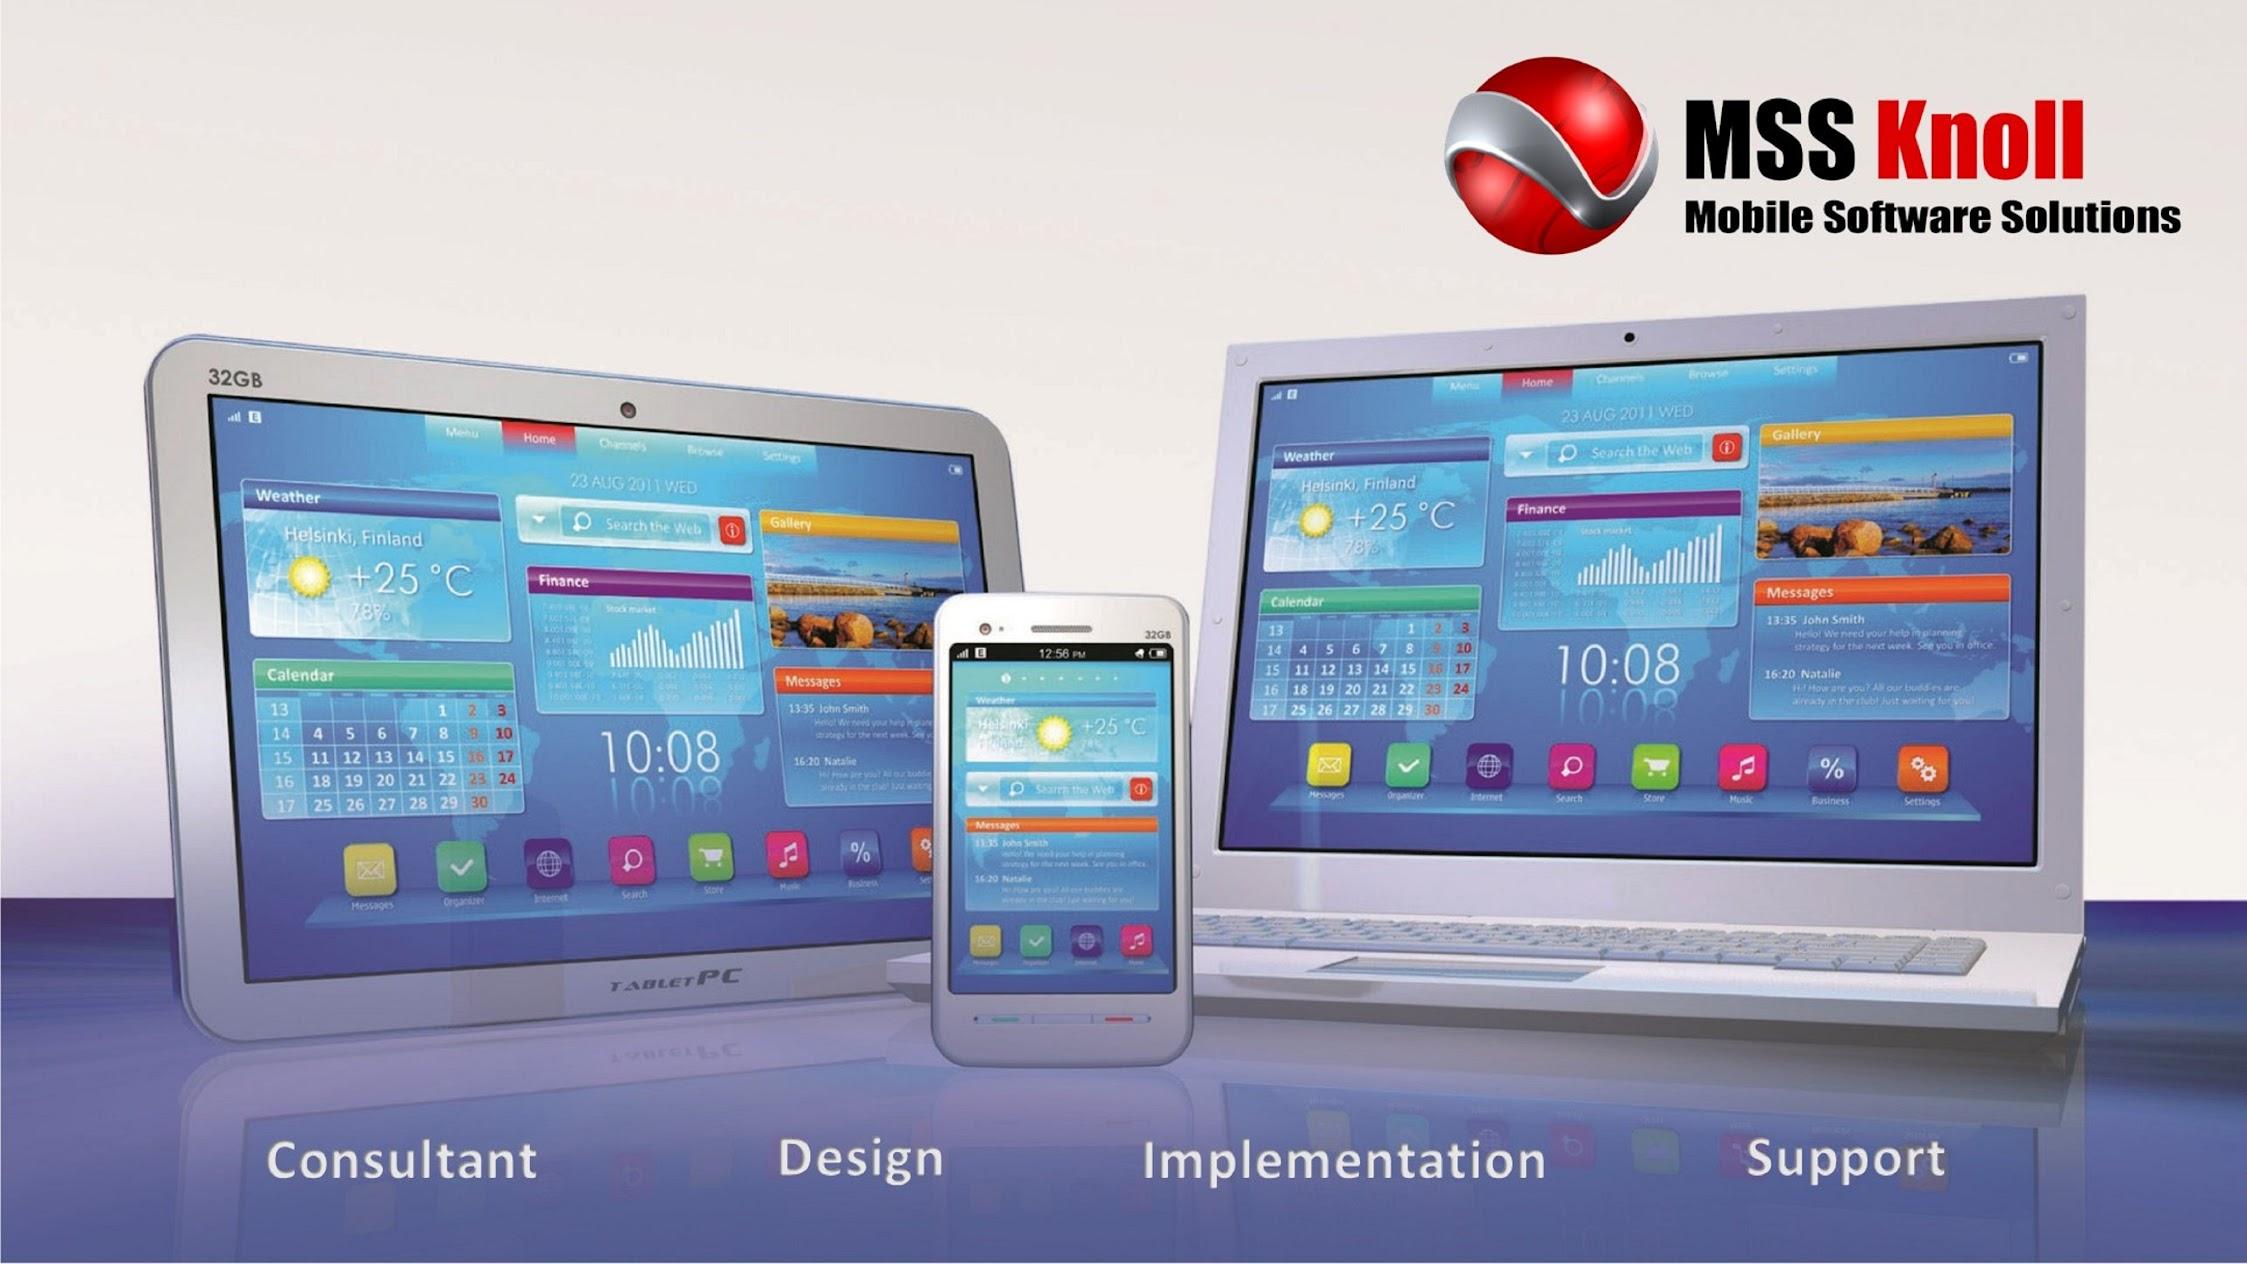 Mobile Software Solutions Knoll e.U.